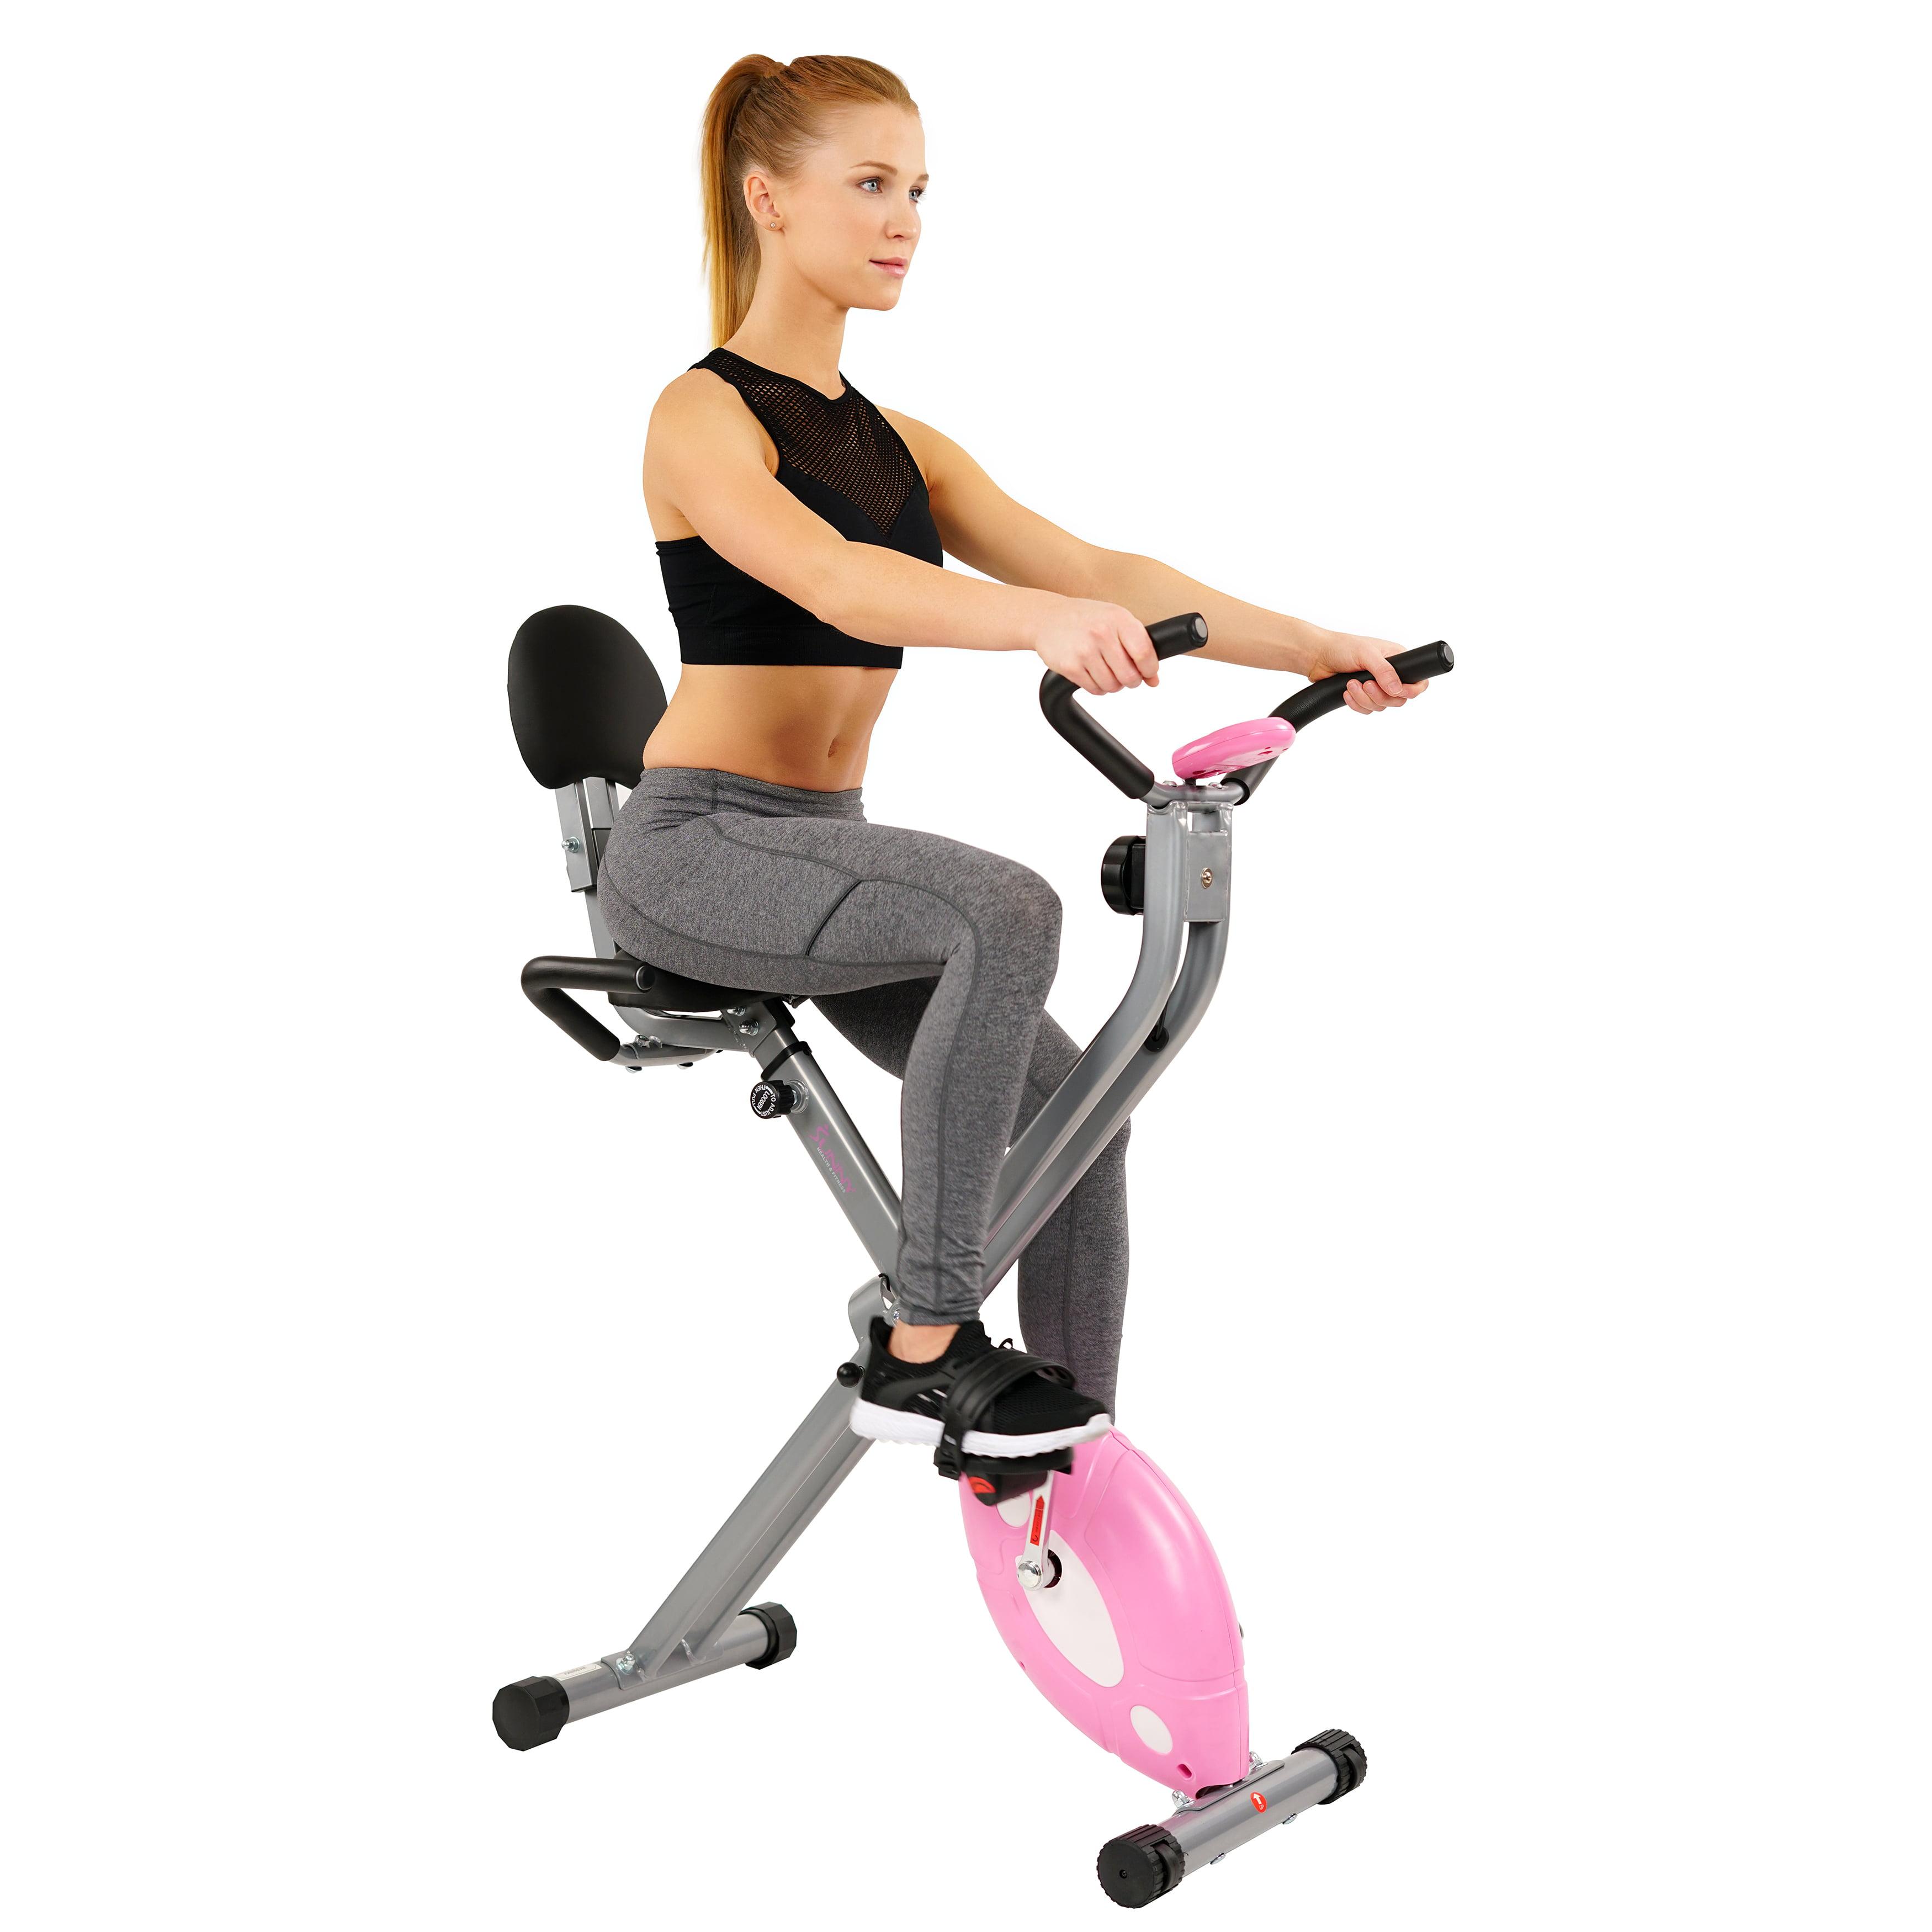 Sunny Health and Fitness SF-RB1117 Folding Recumbent Bike